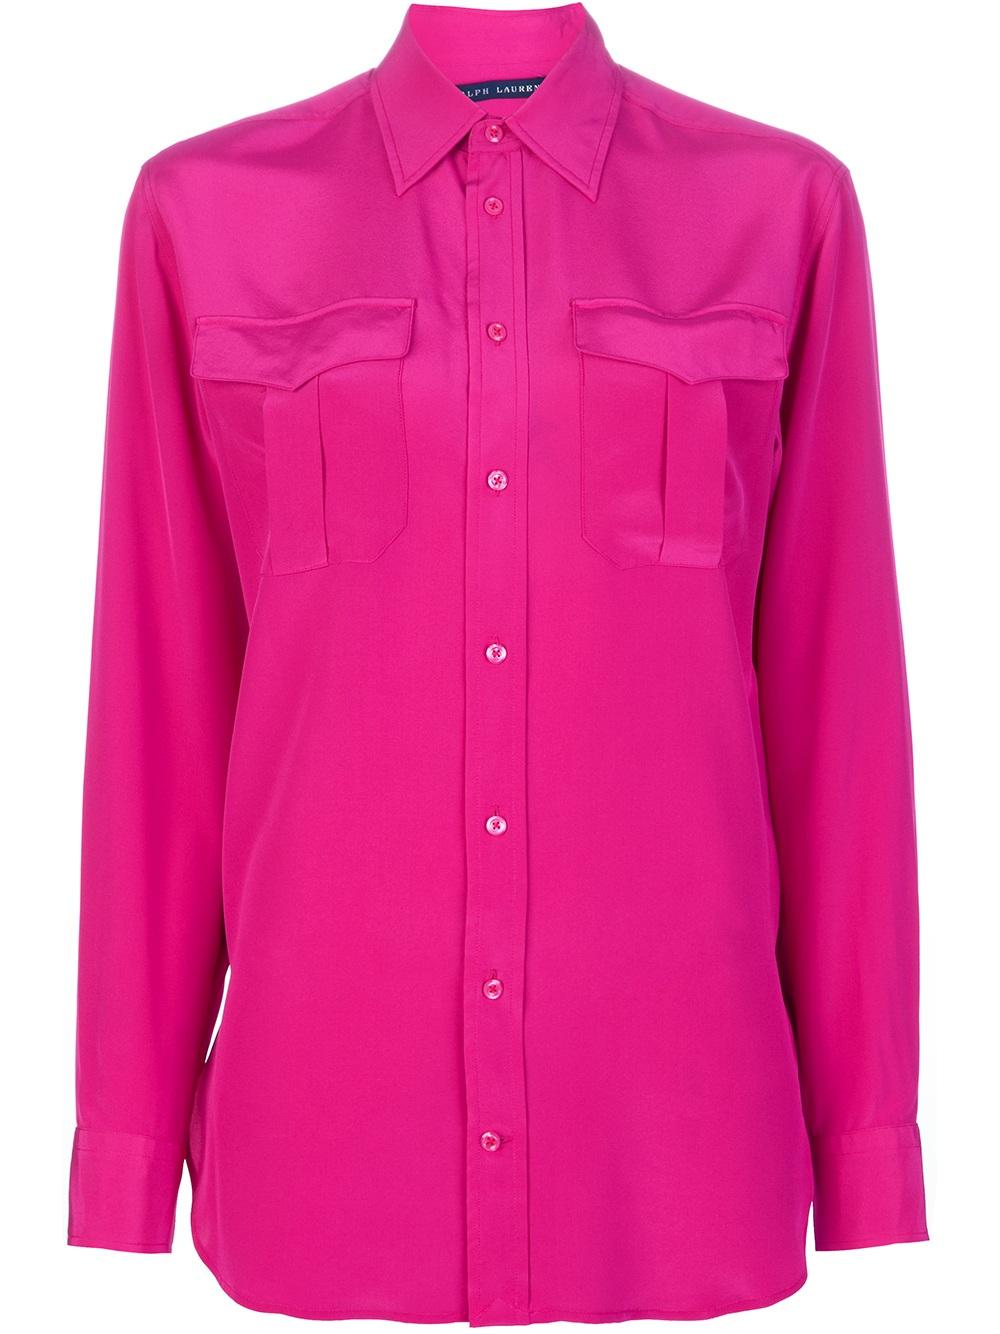 ralph lauren blue label silk blouse in pink lyst. Black Bedroom Furniture Sets. Home Design Ideas